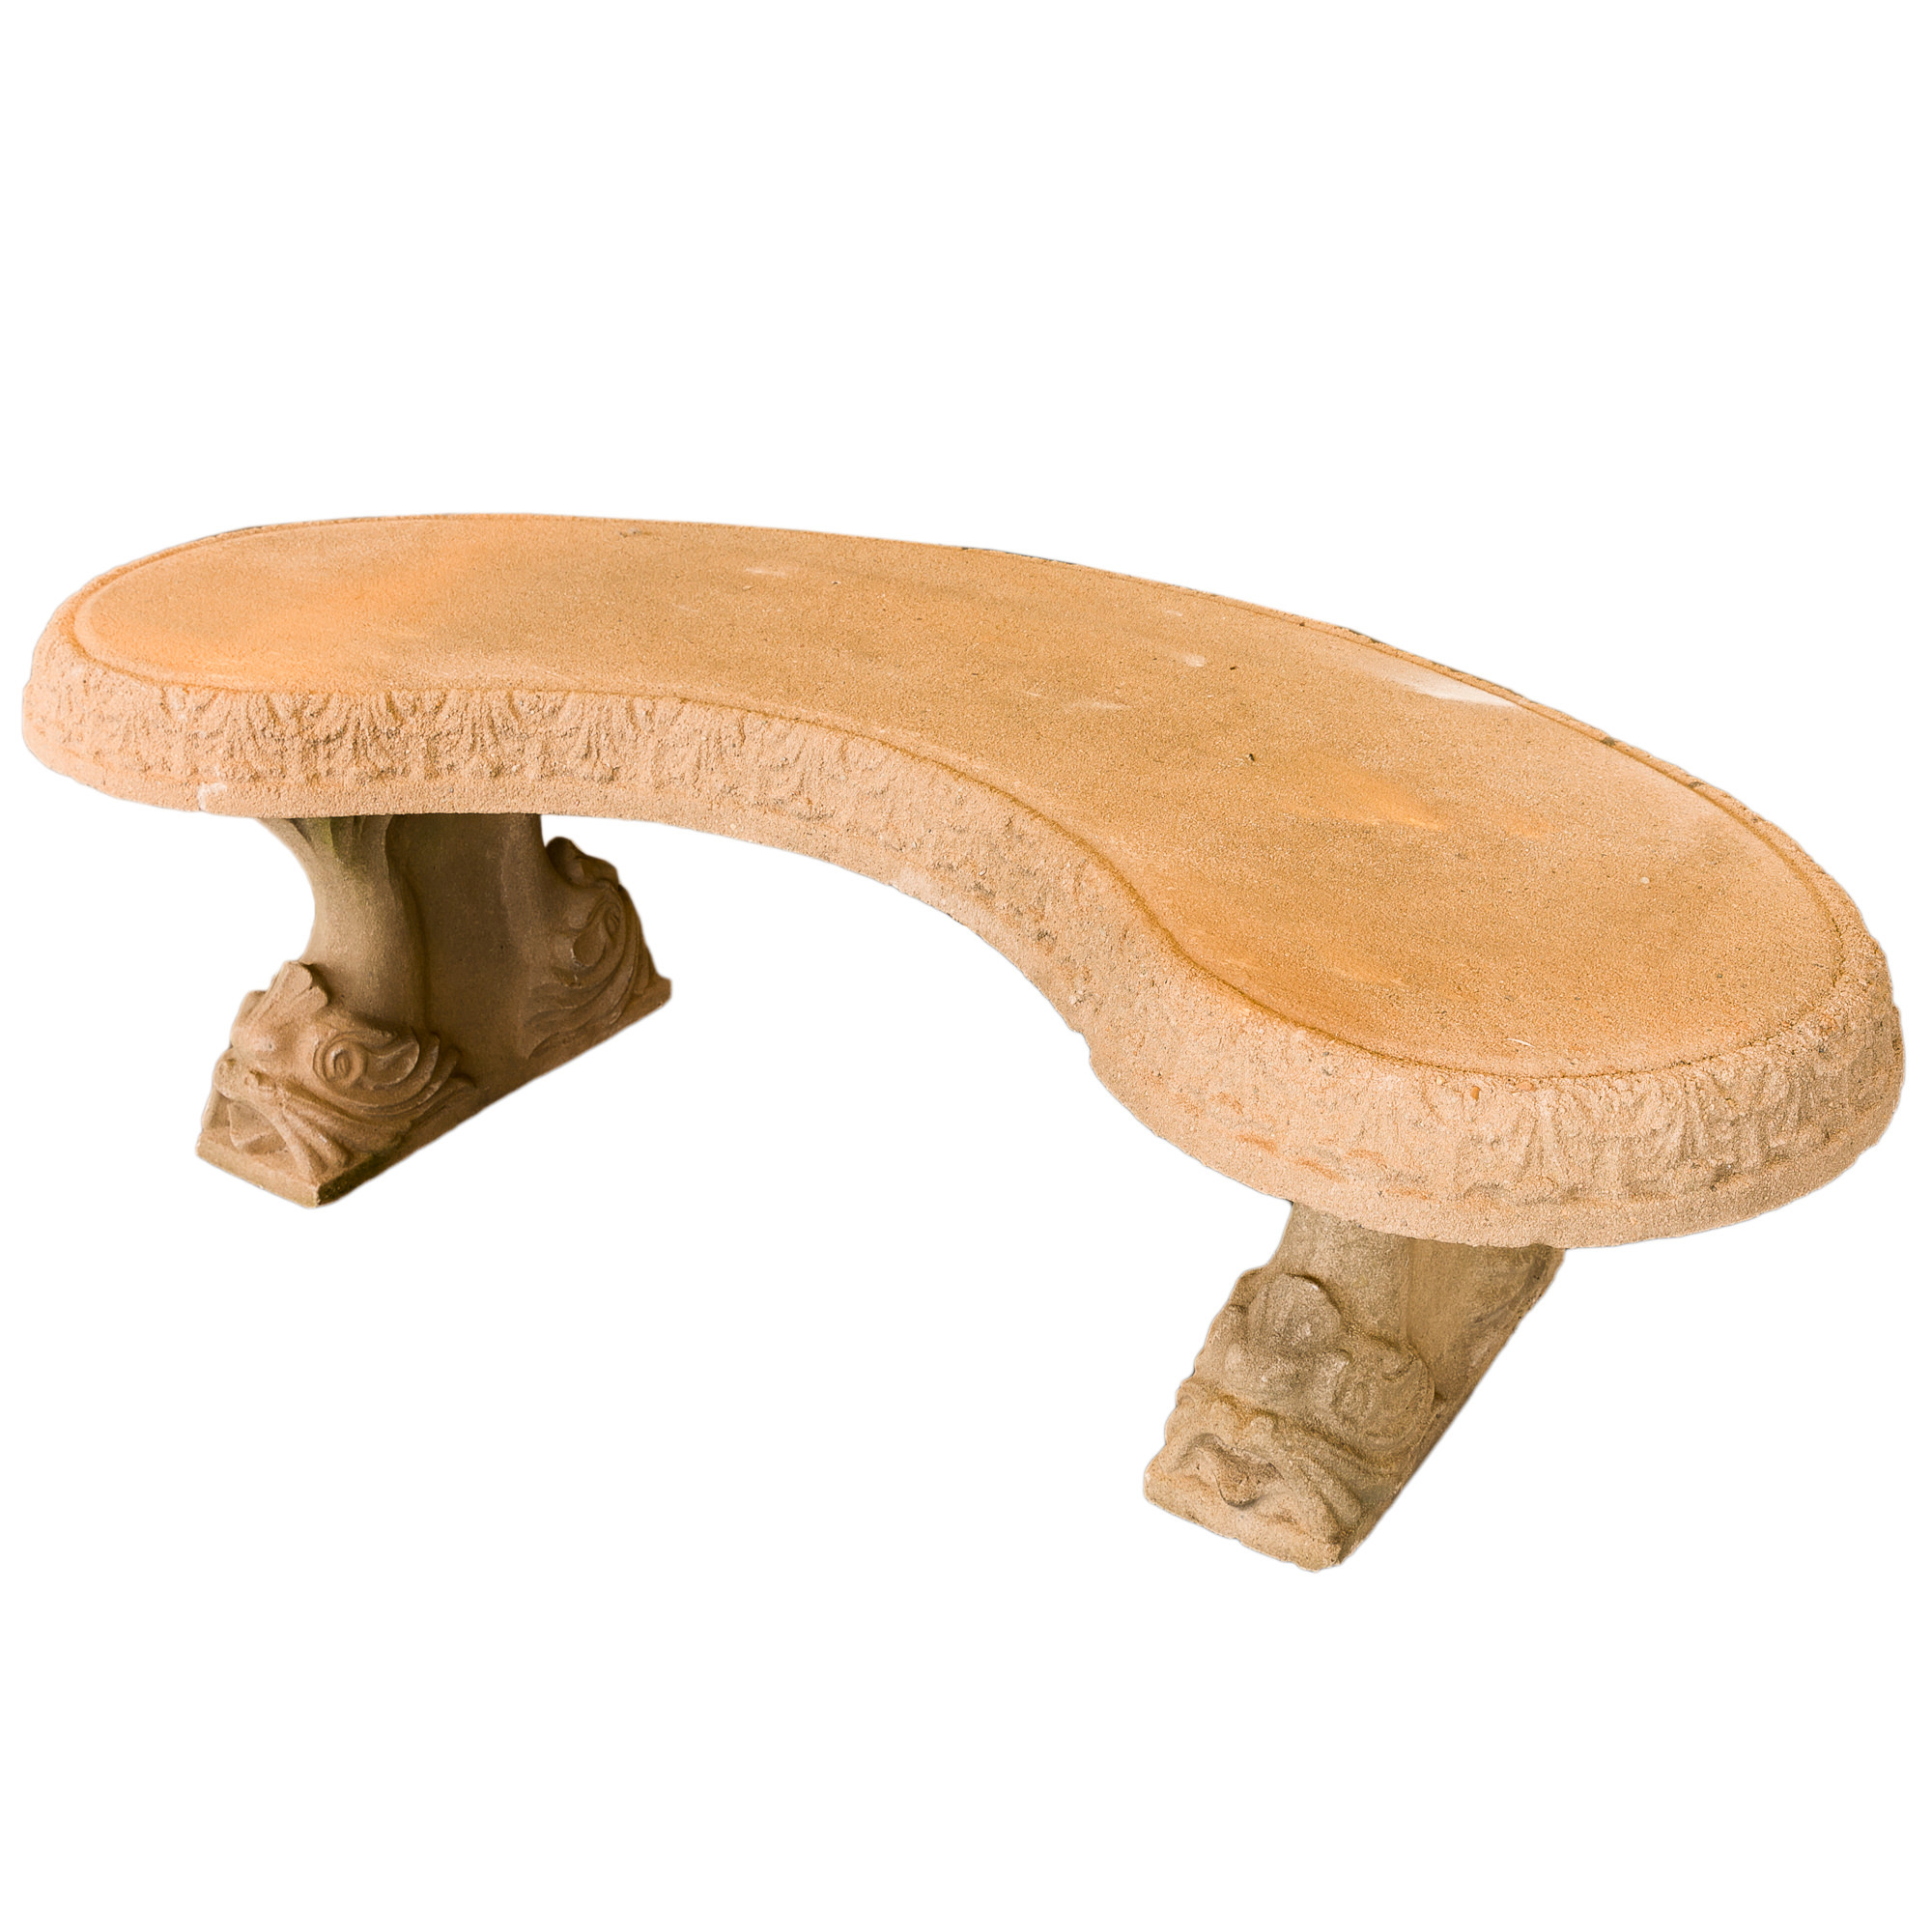 'Cast Composite Sandstone Style Garden Bench'